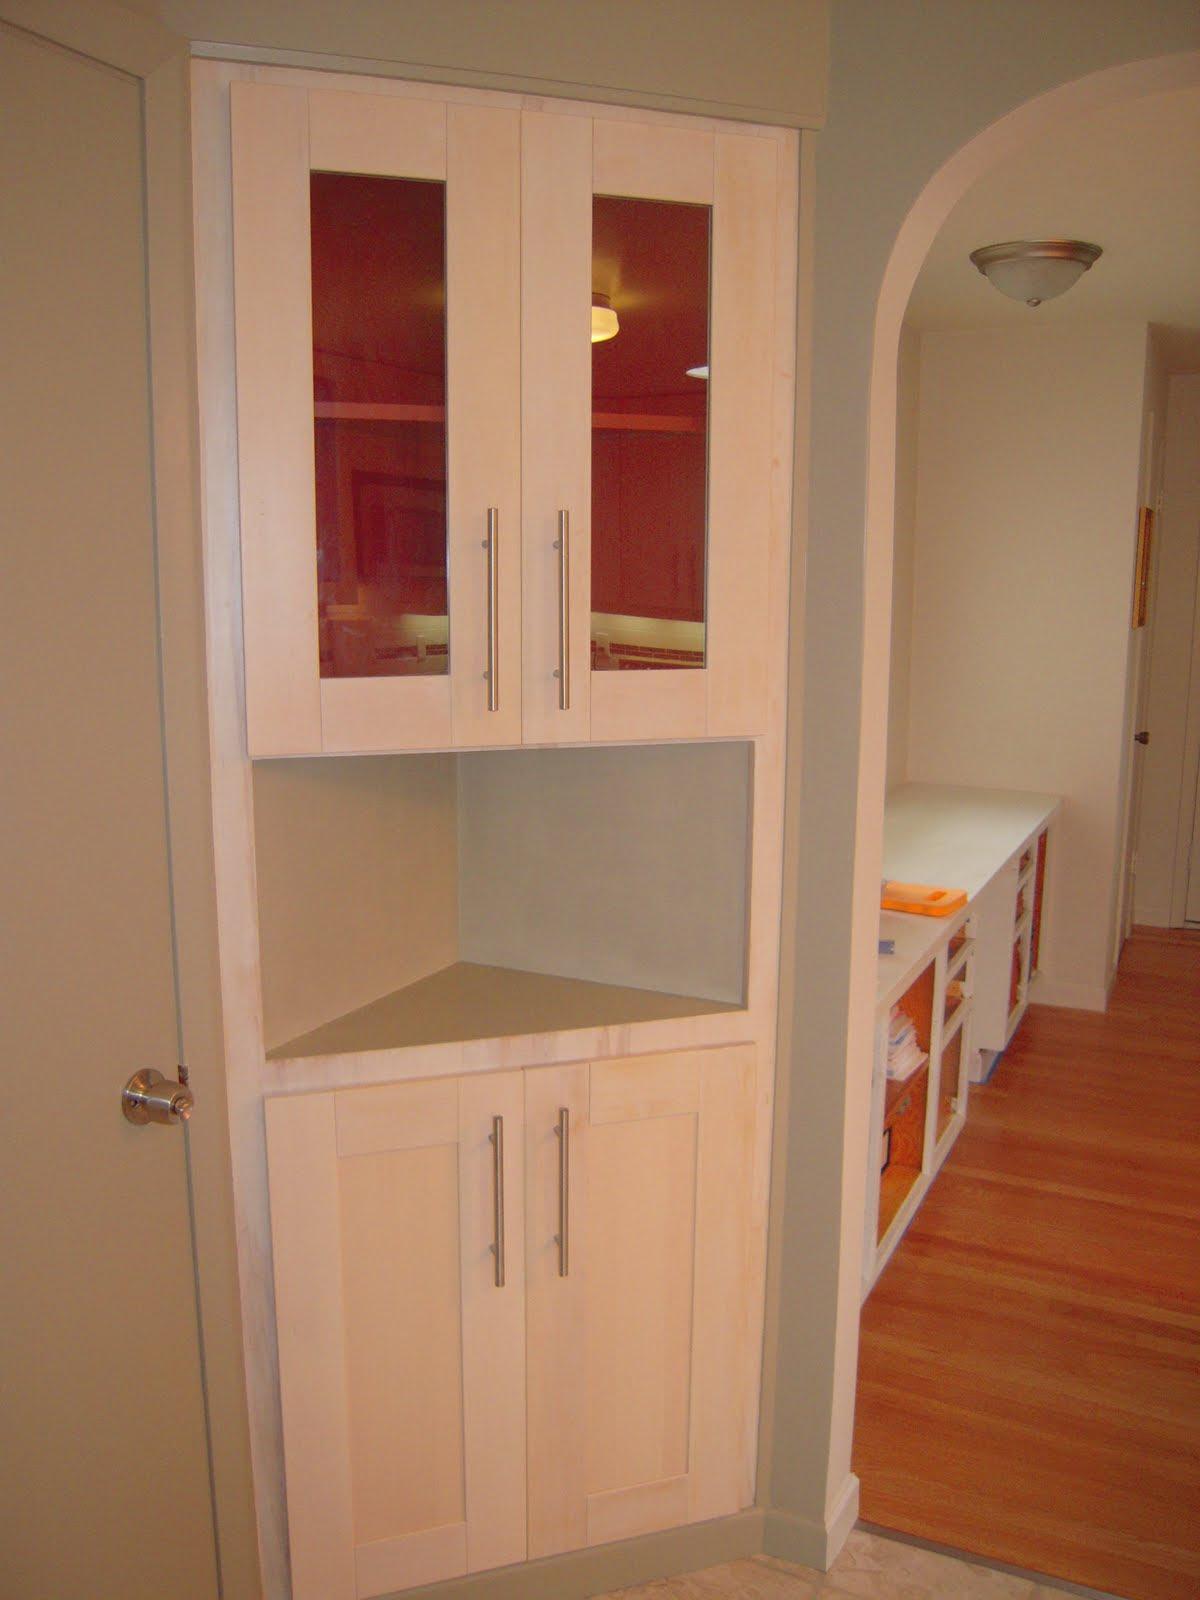 Bathroom to Computer room using Kitchen Cupboards - IKEA Hackers